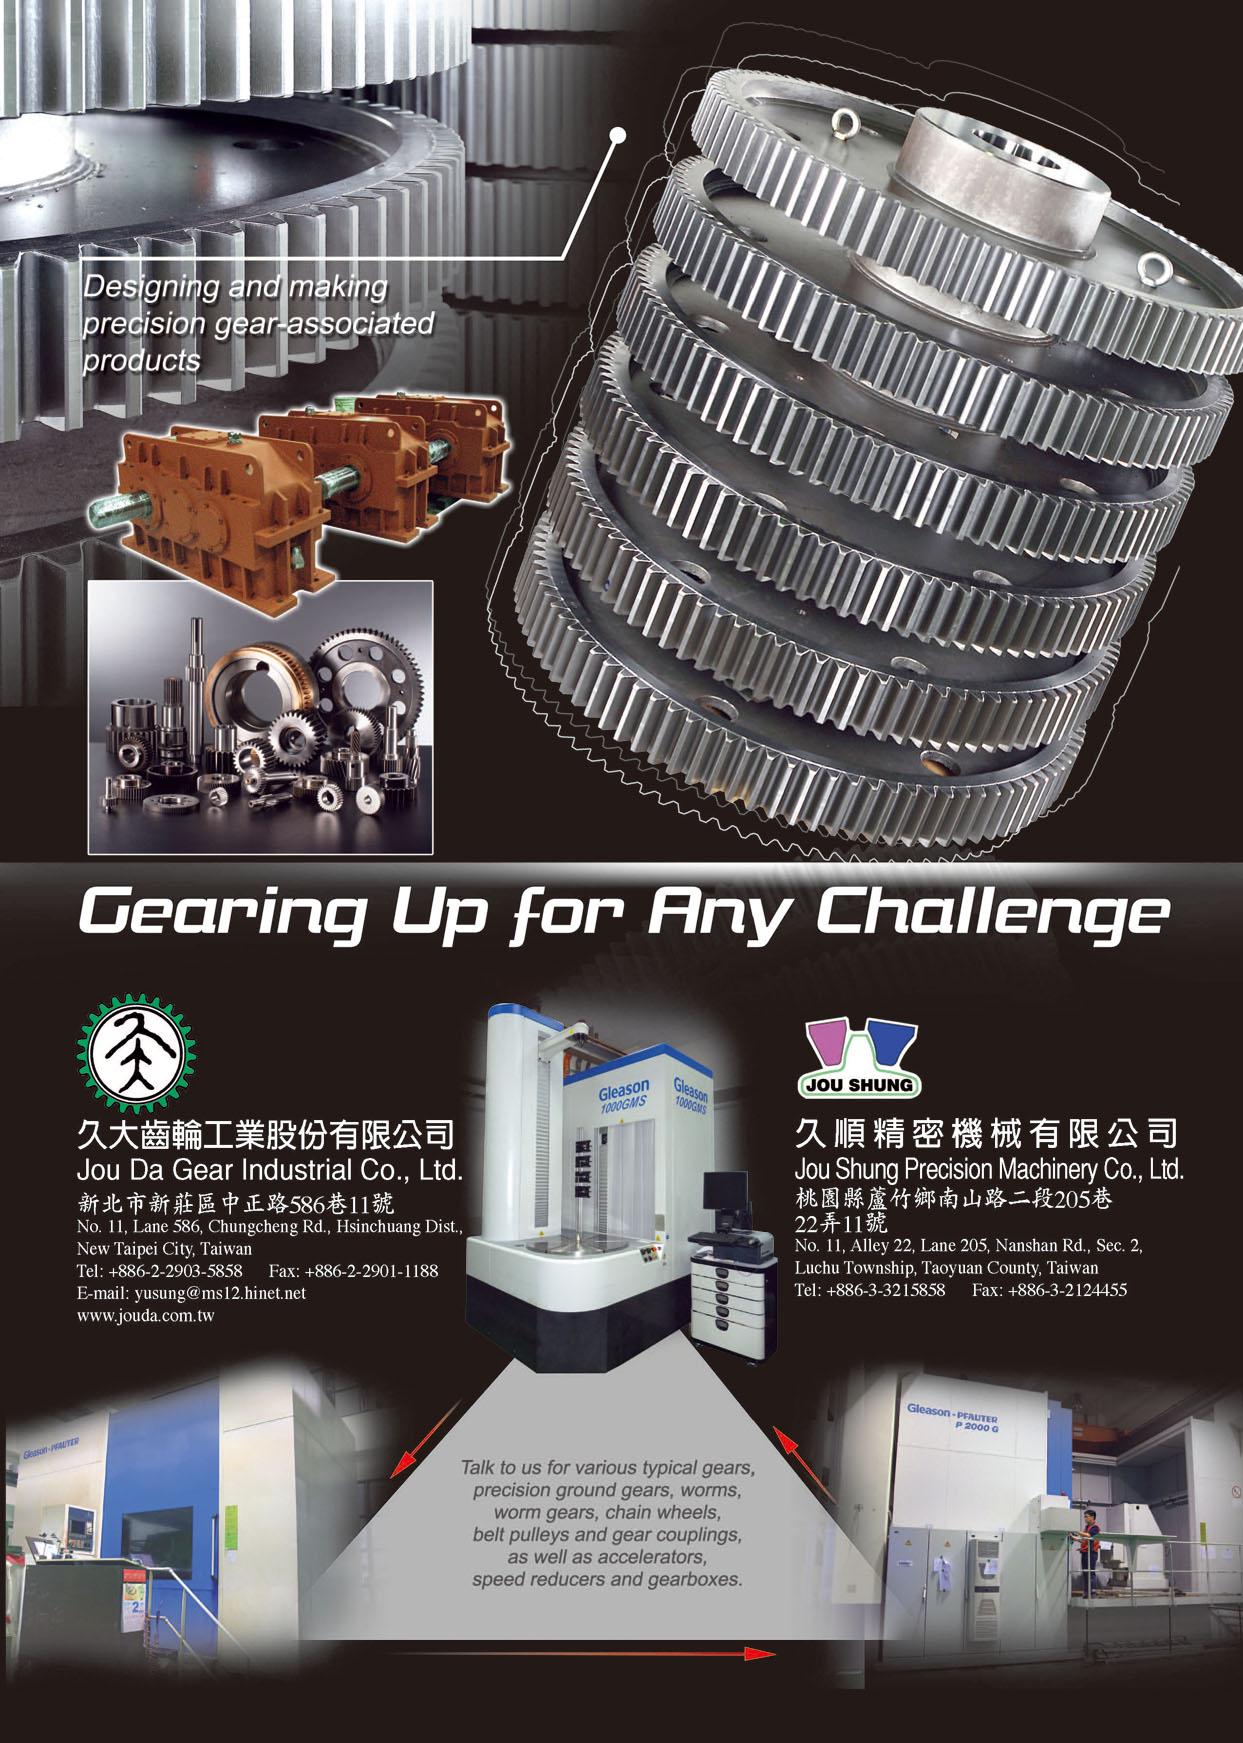 JOU SHUNG PRECISION MACHINERY CO., LTD.